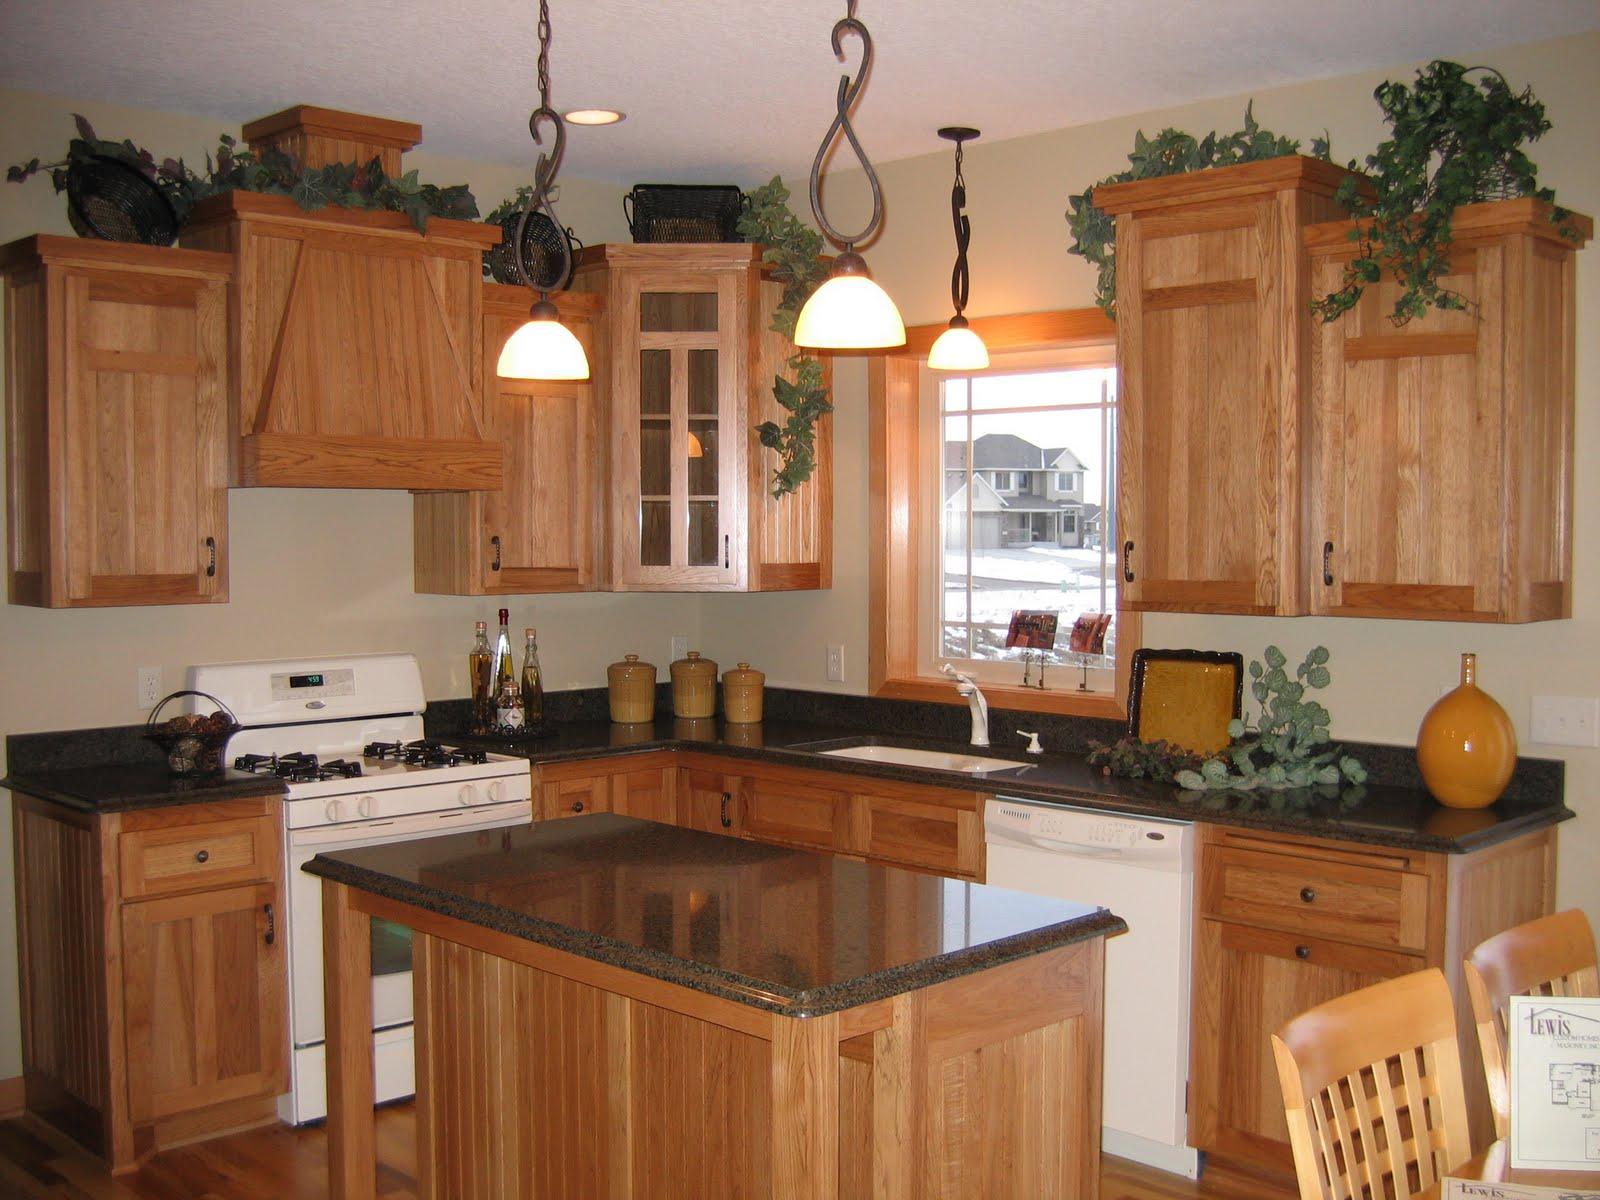 Kitchen Cabinets: Kitchen Cabinets Sarasota - Florida